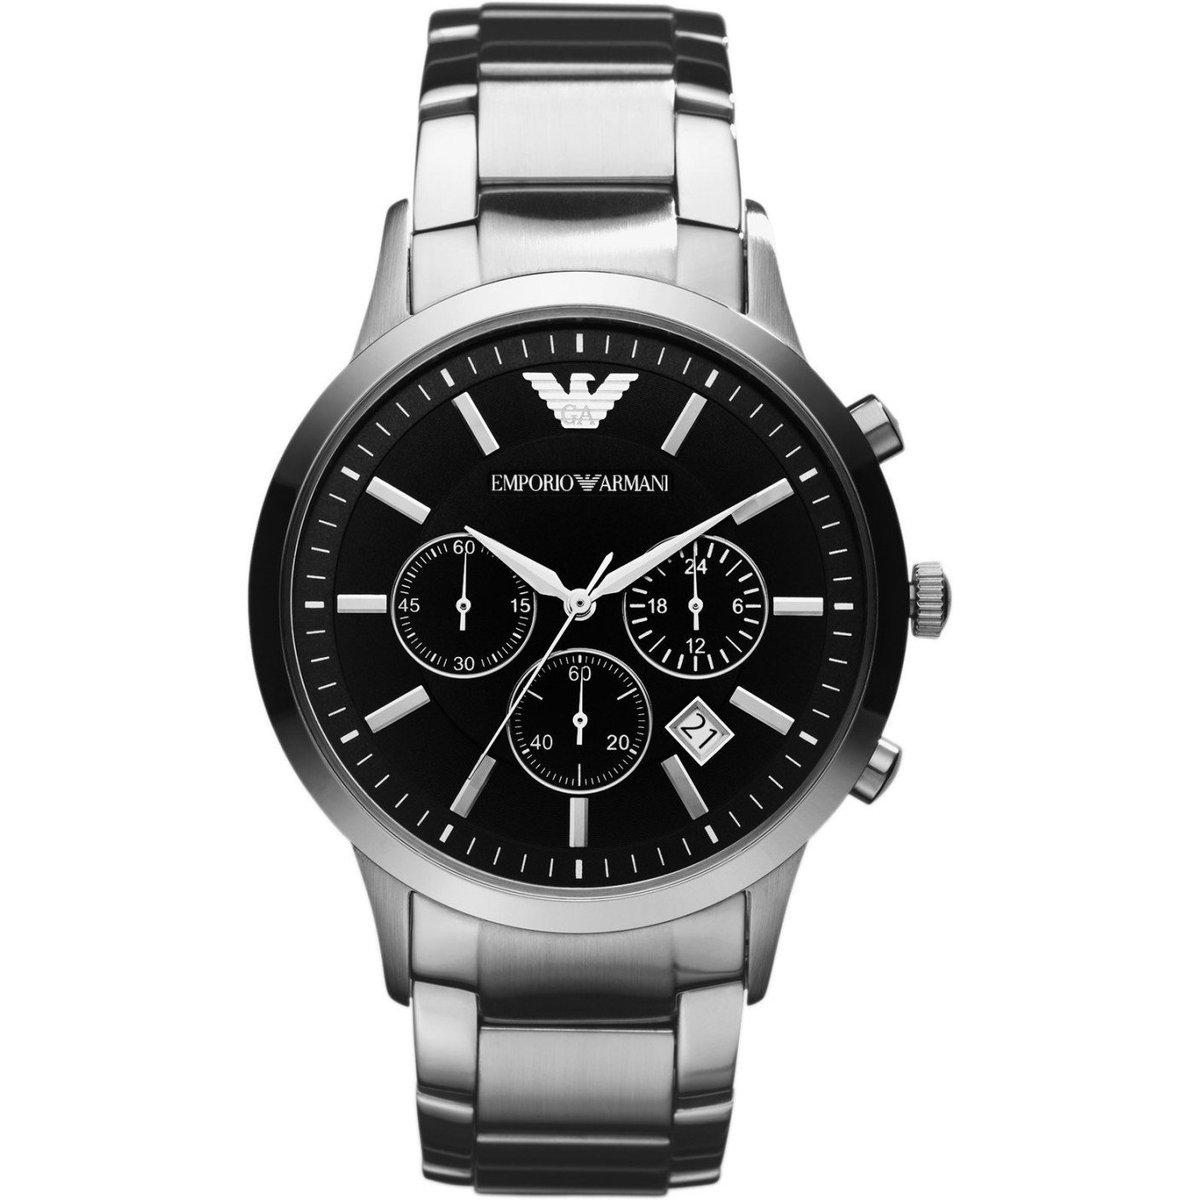 Emporio Armani AR2434 Men's Black Chronograph Watch £88 delivered using code @ Watch Pilot